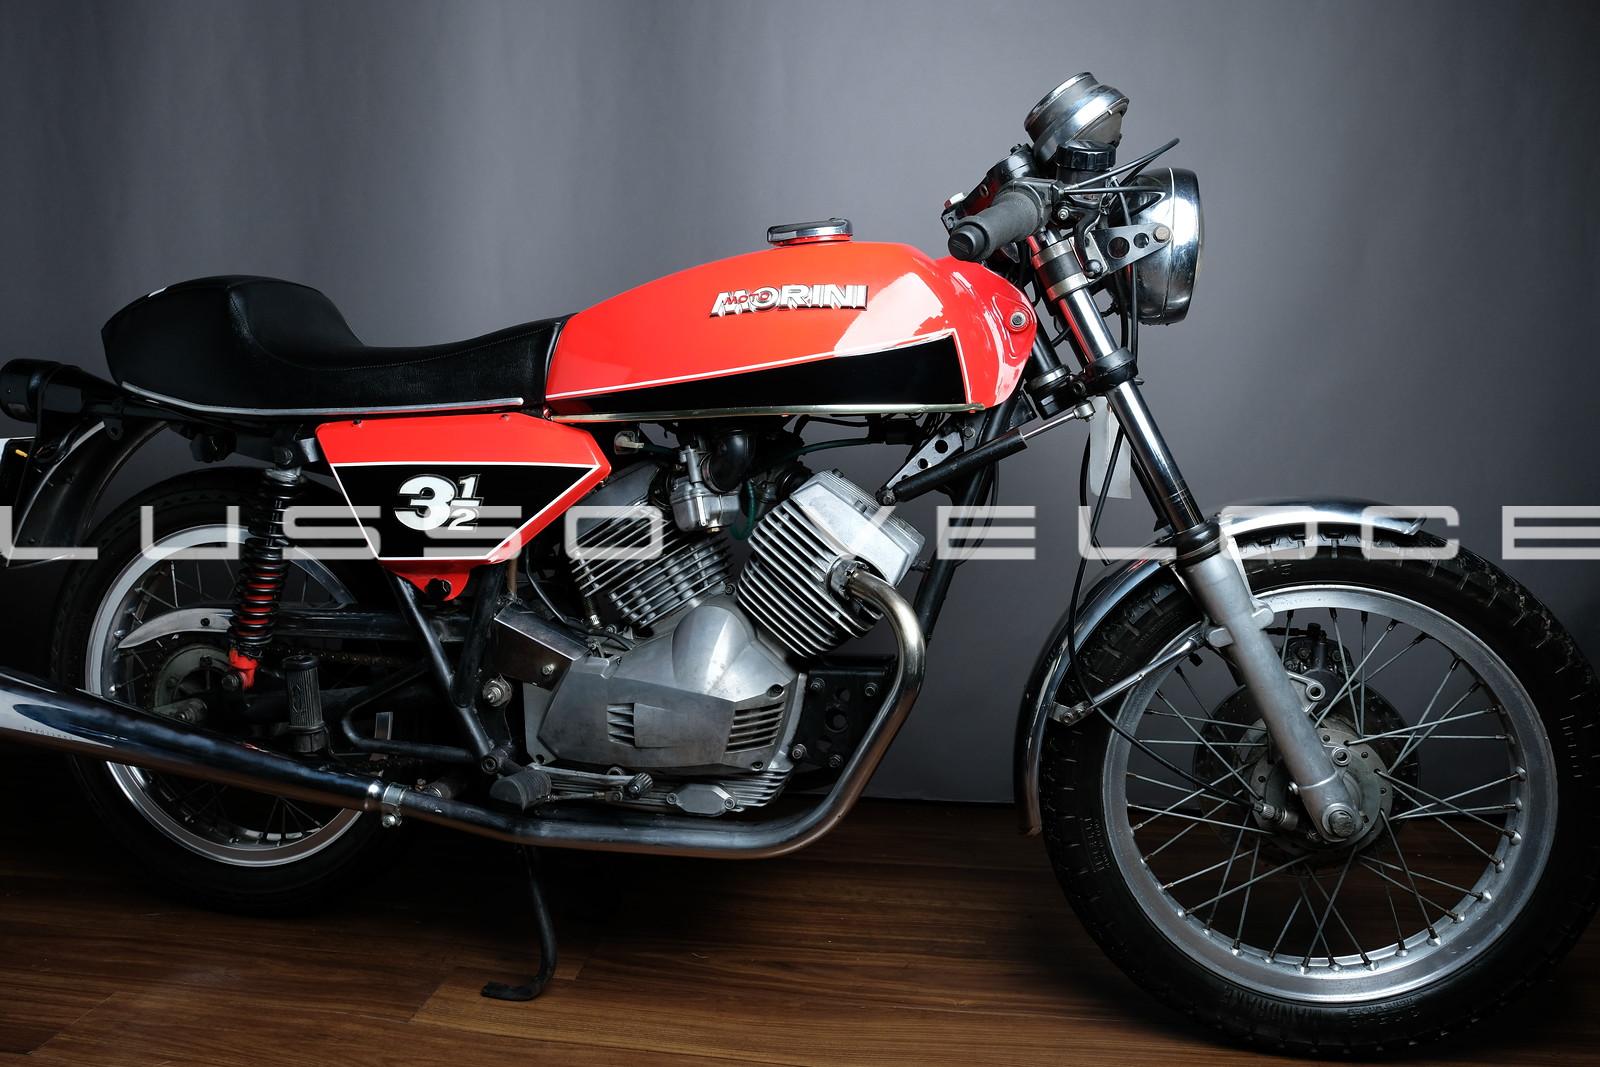 Moto Morini 350 Sport Wires and disc